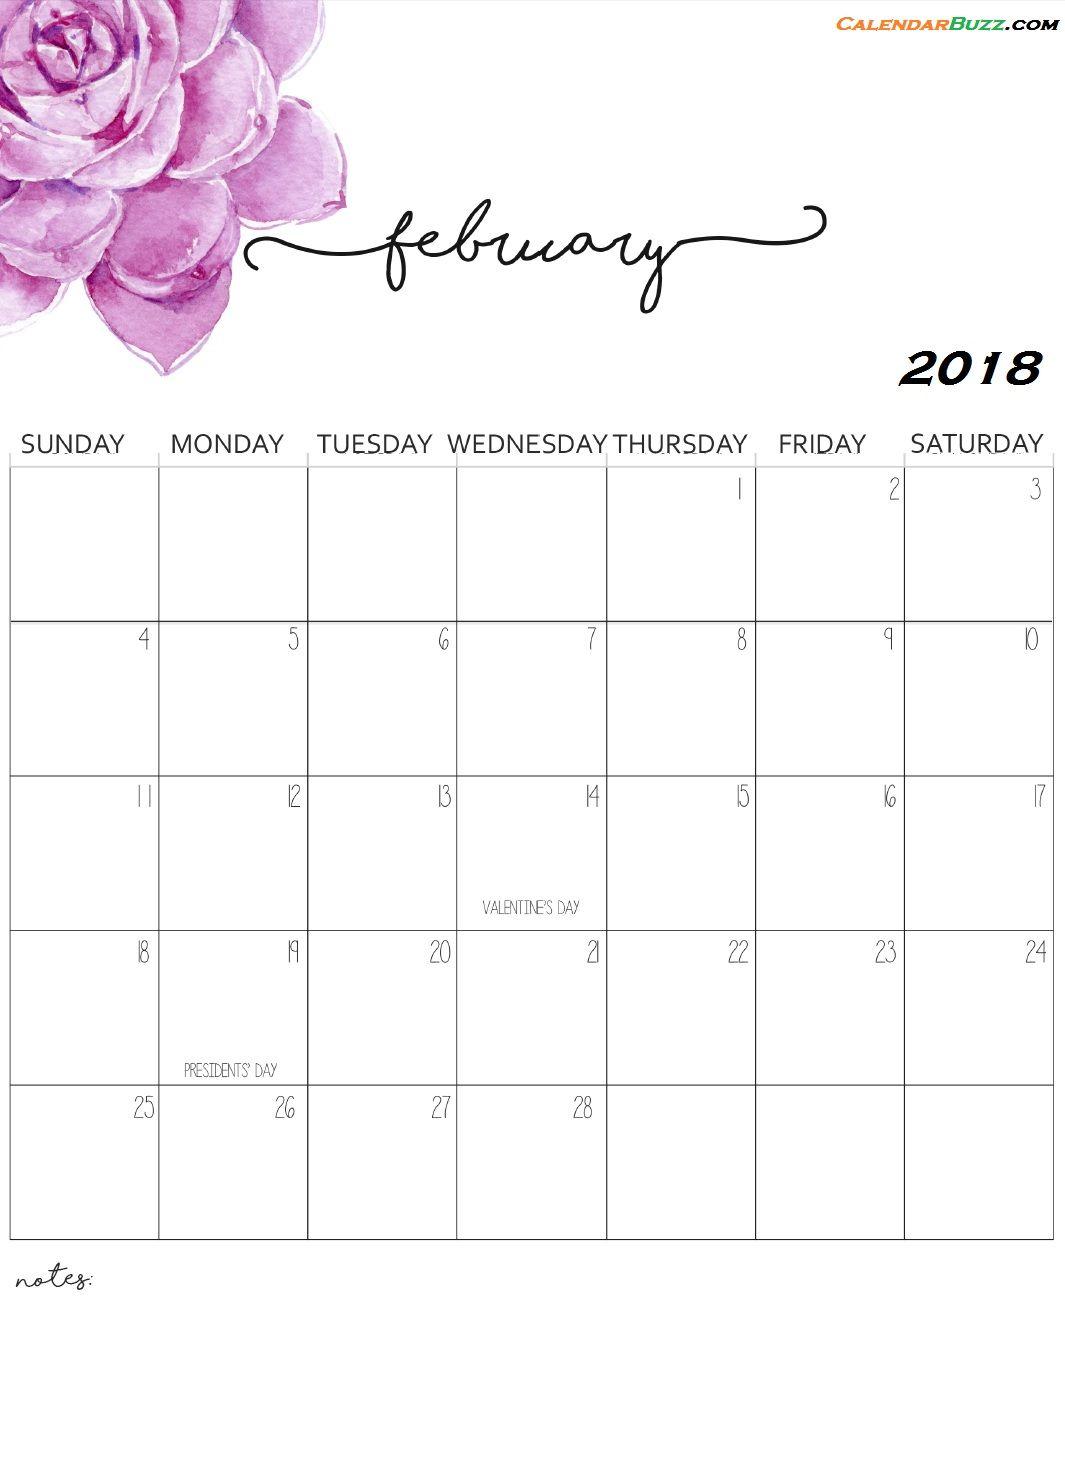 Monthly Wall Calendar February